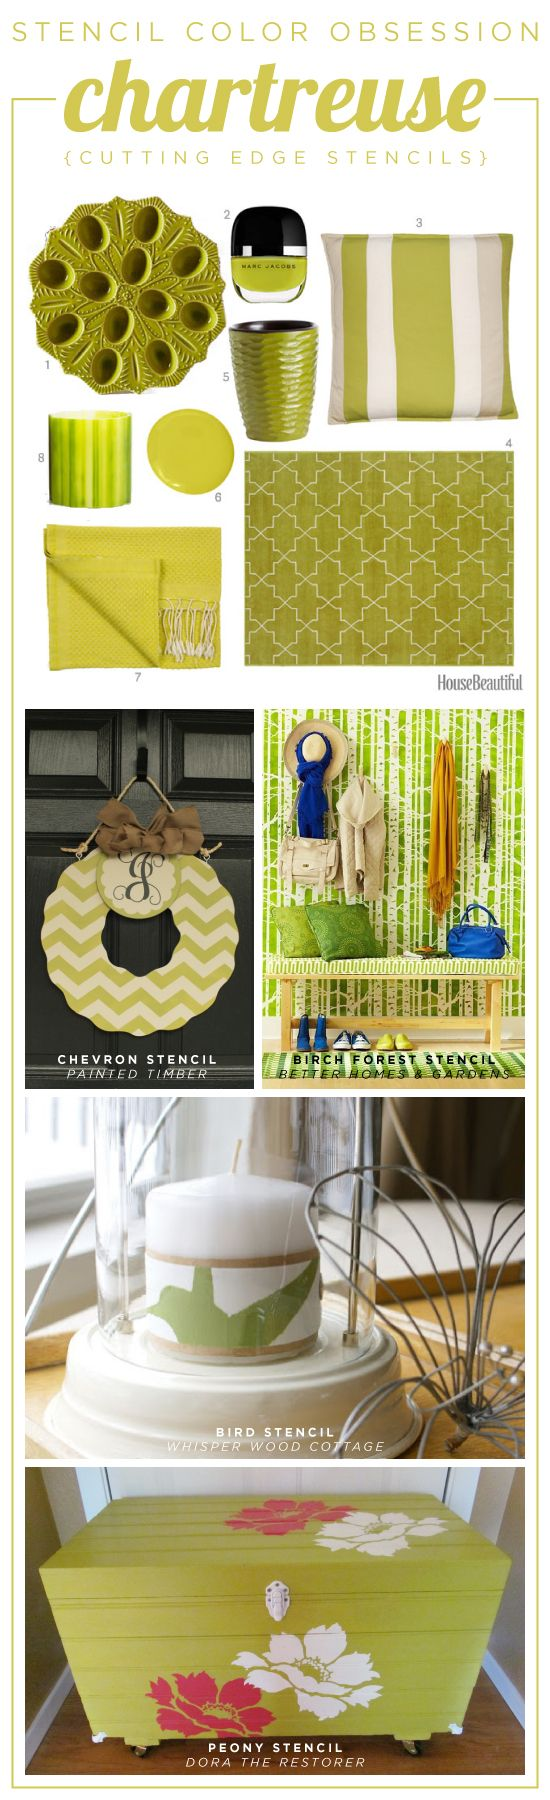 49 best Inspiring Interior Design Images images on Pinterest   Wall ...